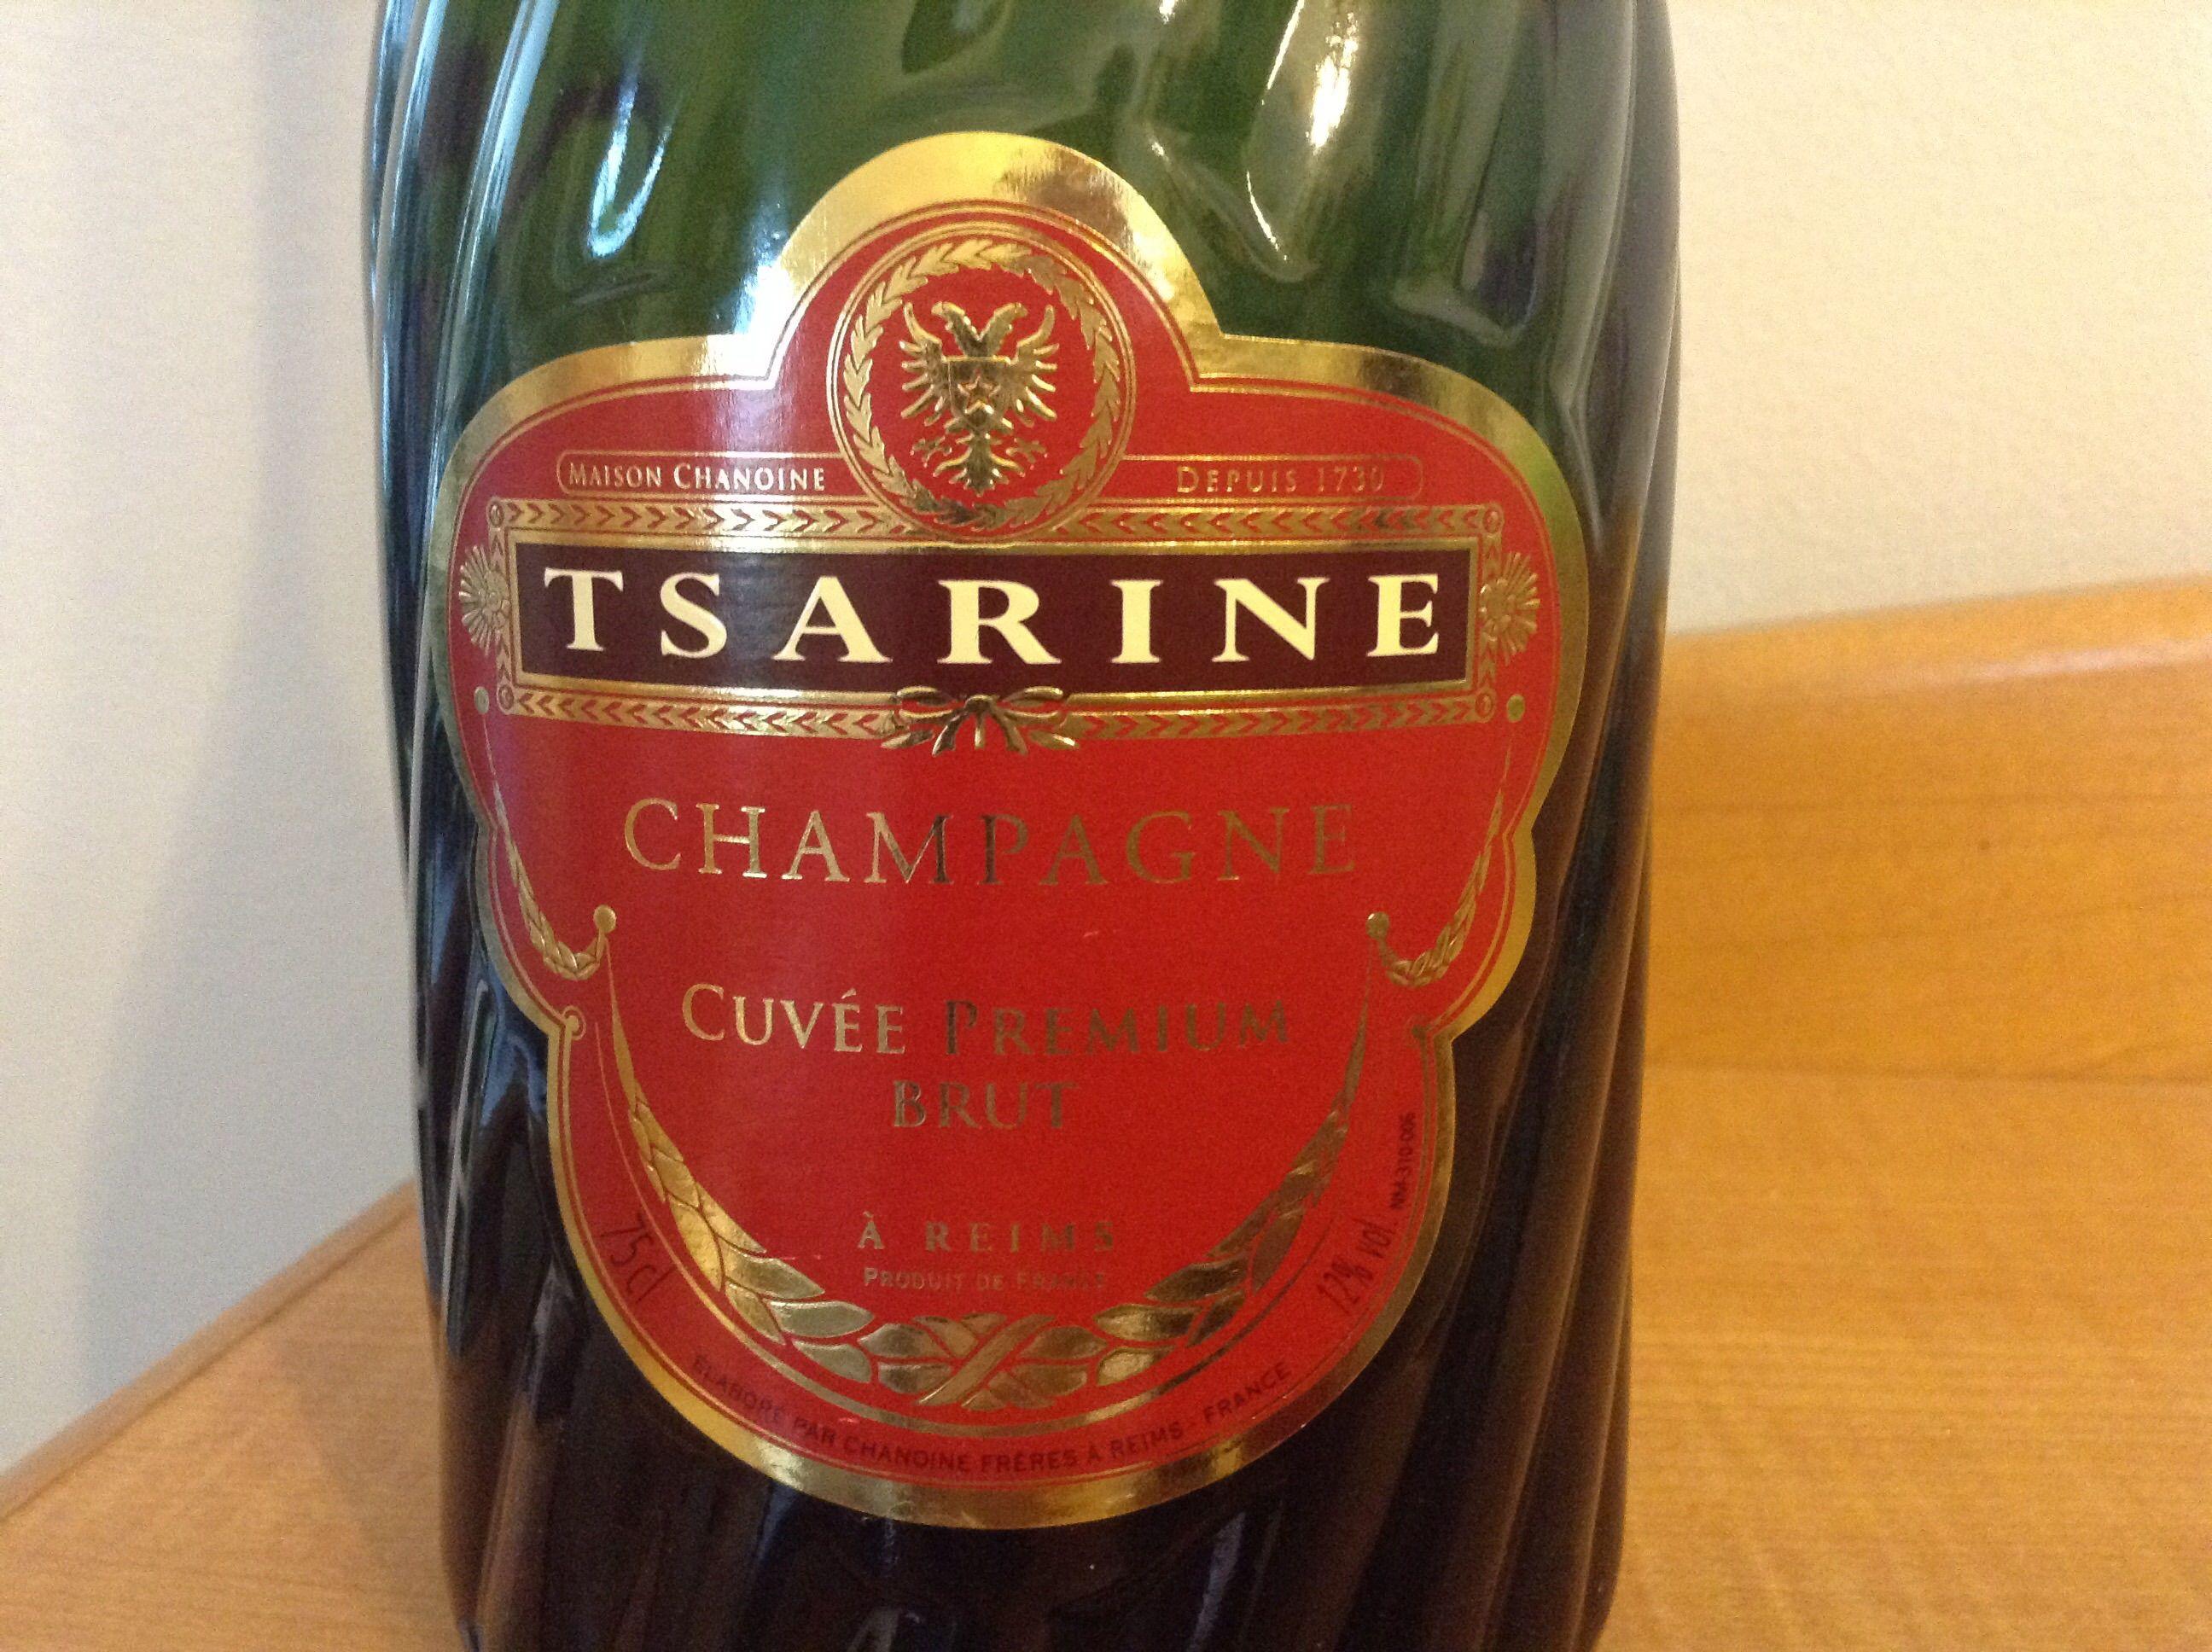 Tsarine Label